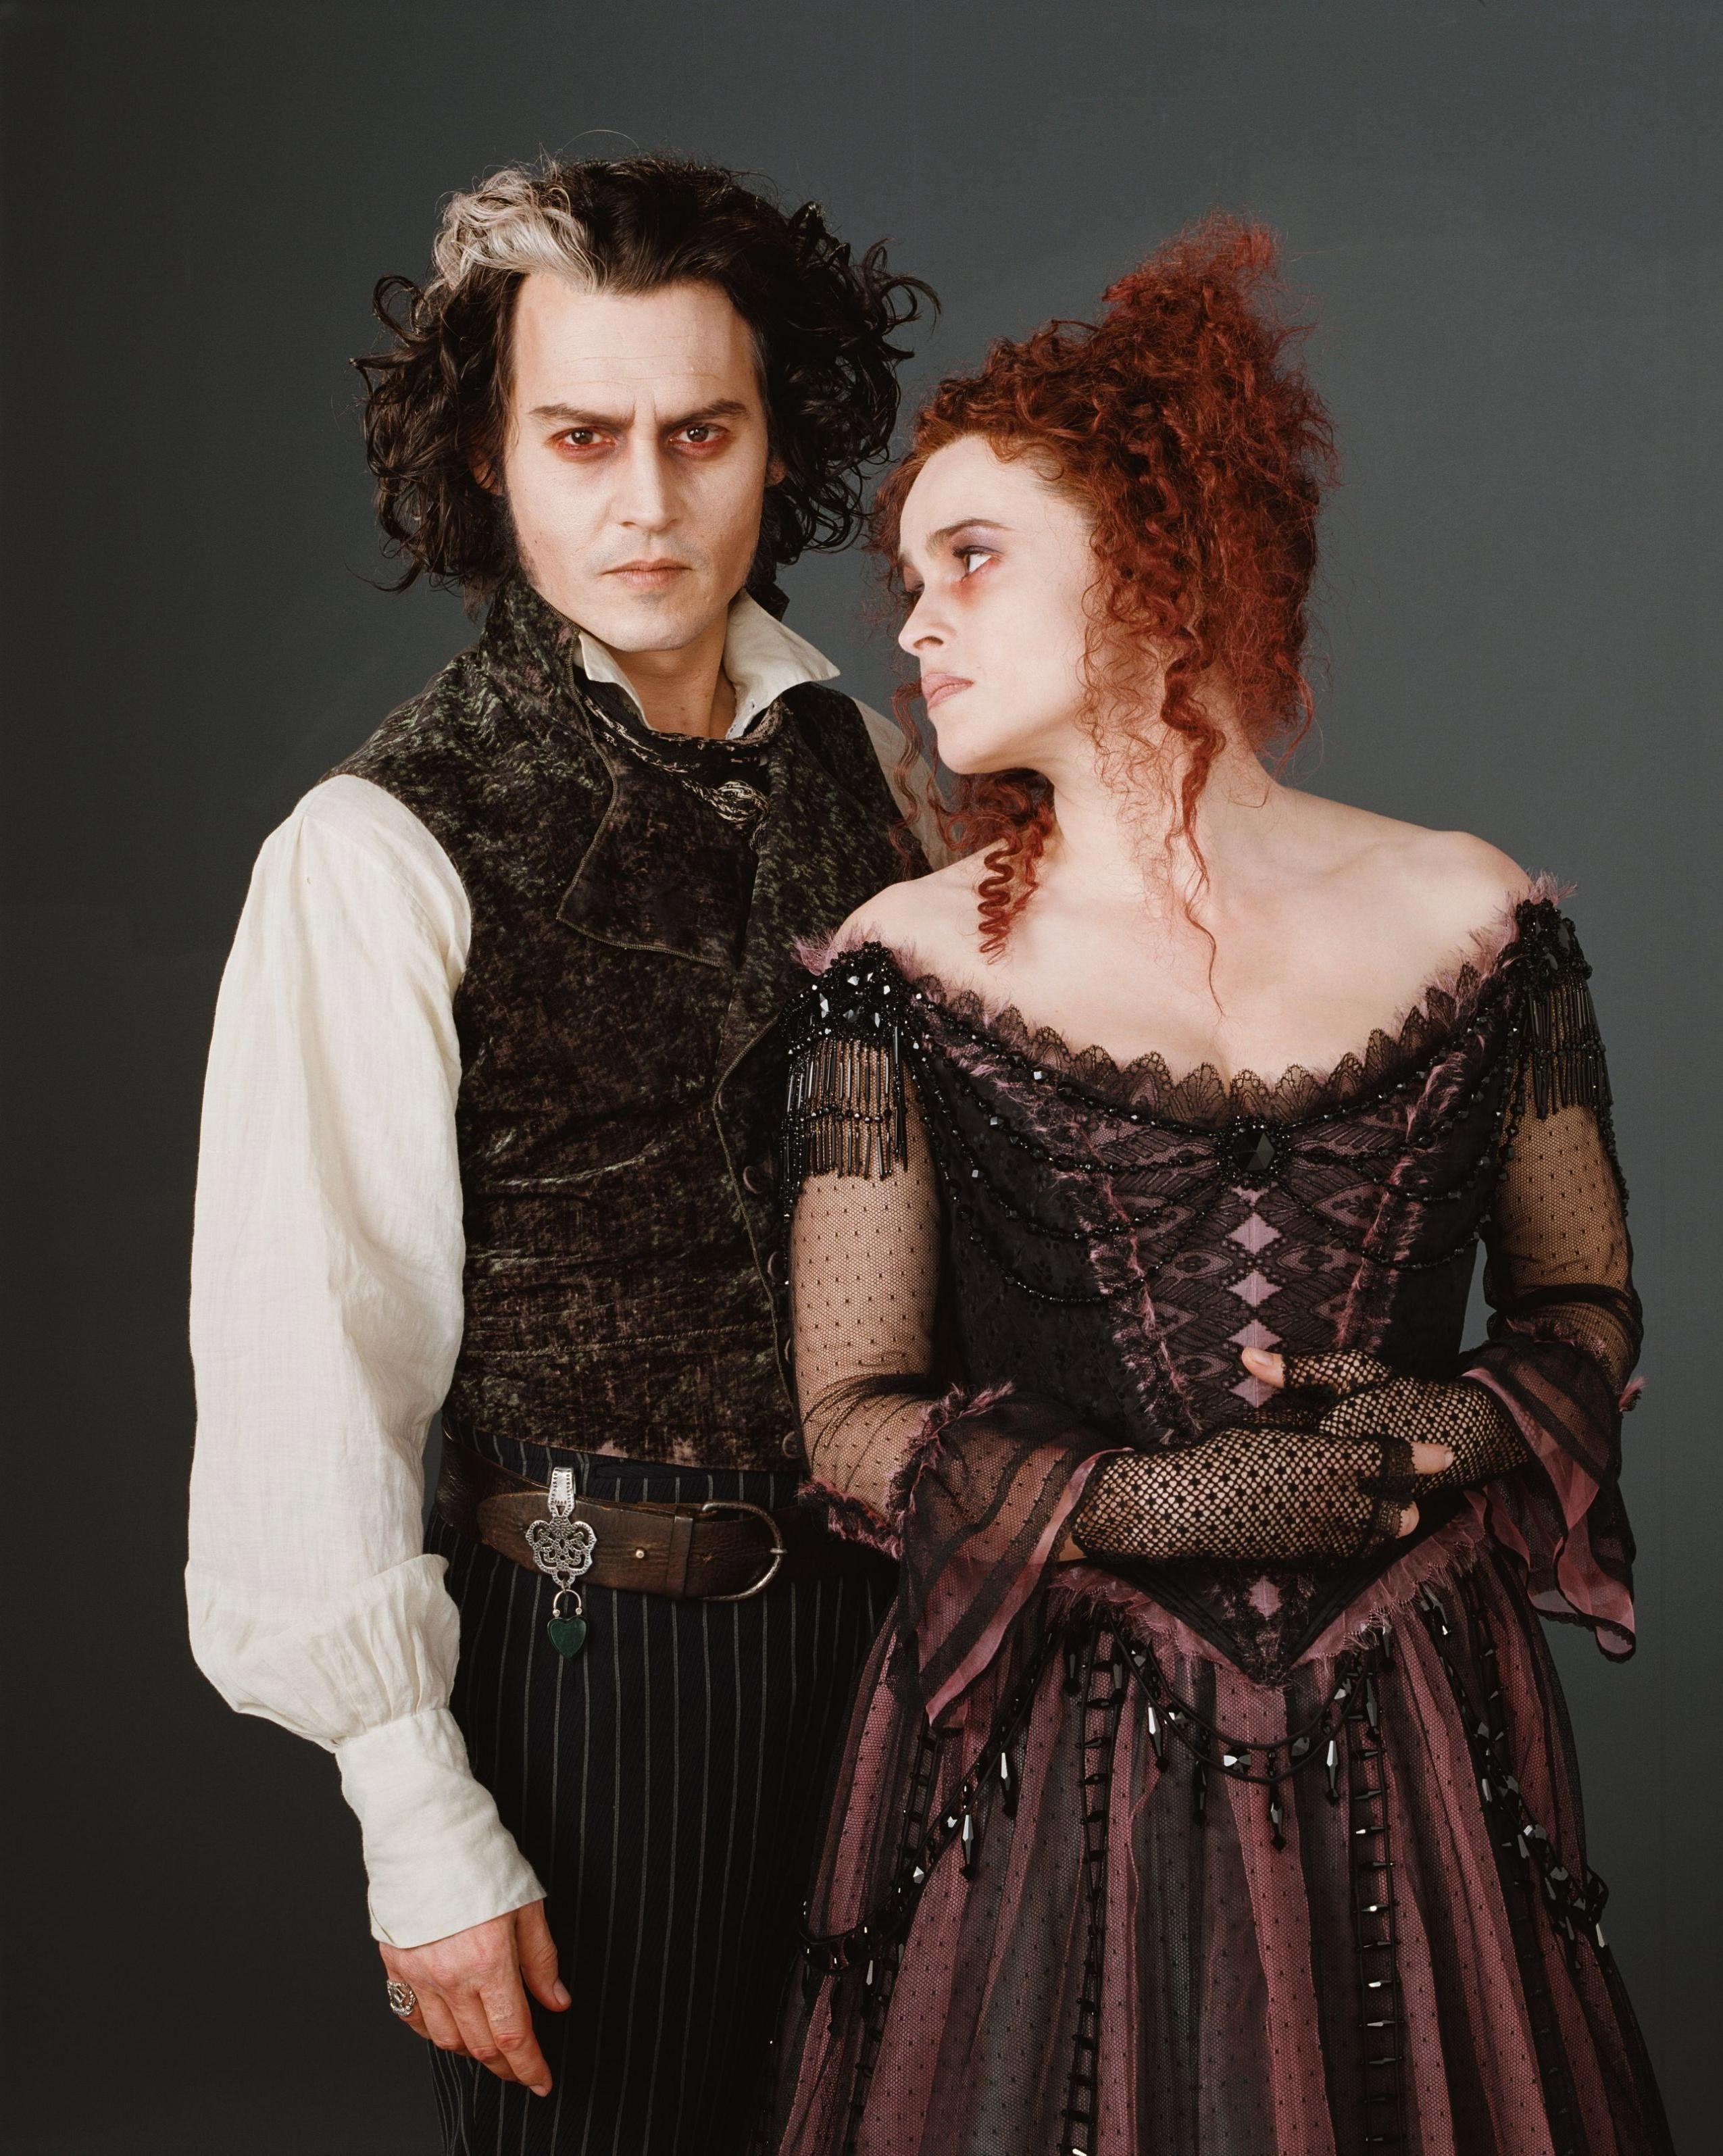 Sweeney Todd And Mrs Lovett Johnny Depp And Helena Bonham Carter Fantasie Kostuums Prachtige Jurken Jurken